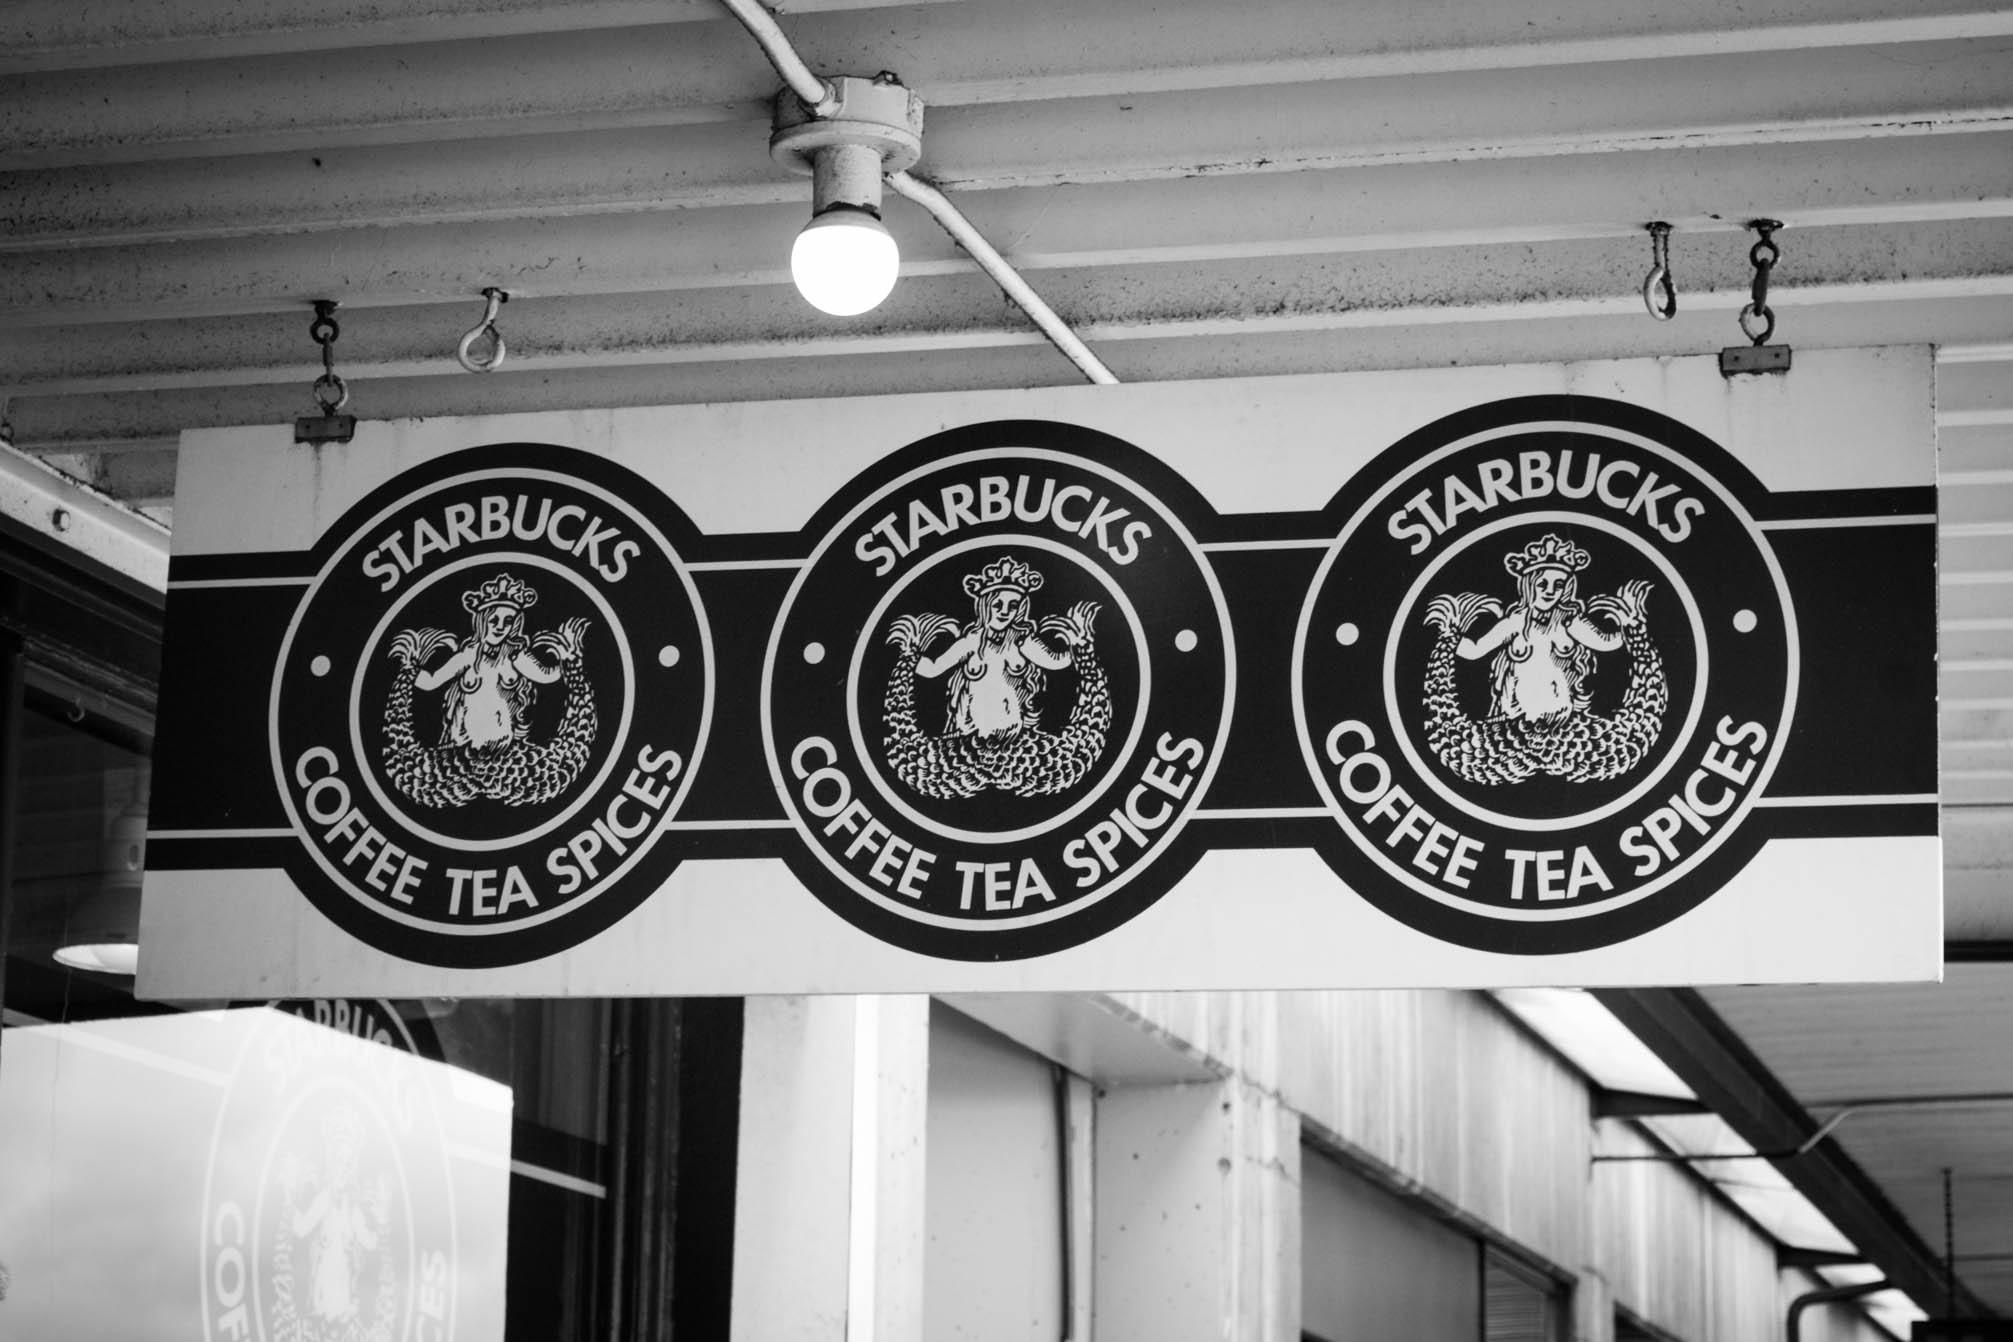 Starbucks Coffee, l'origine